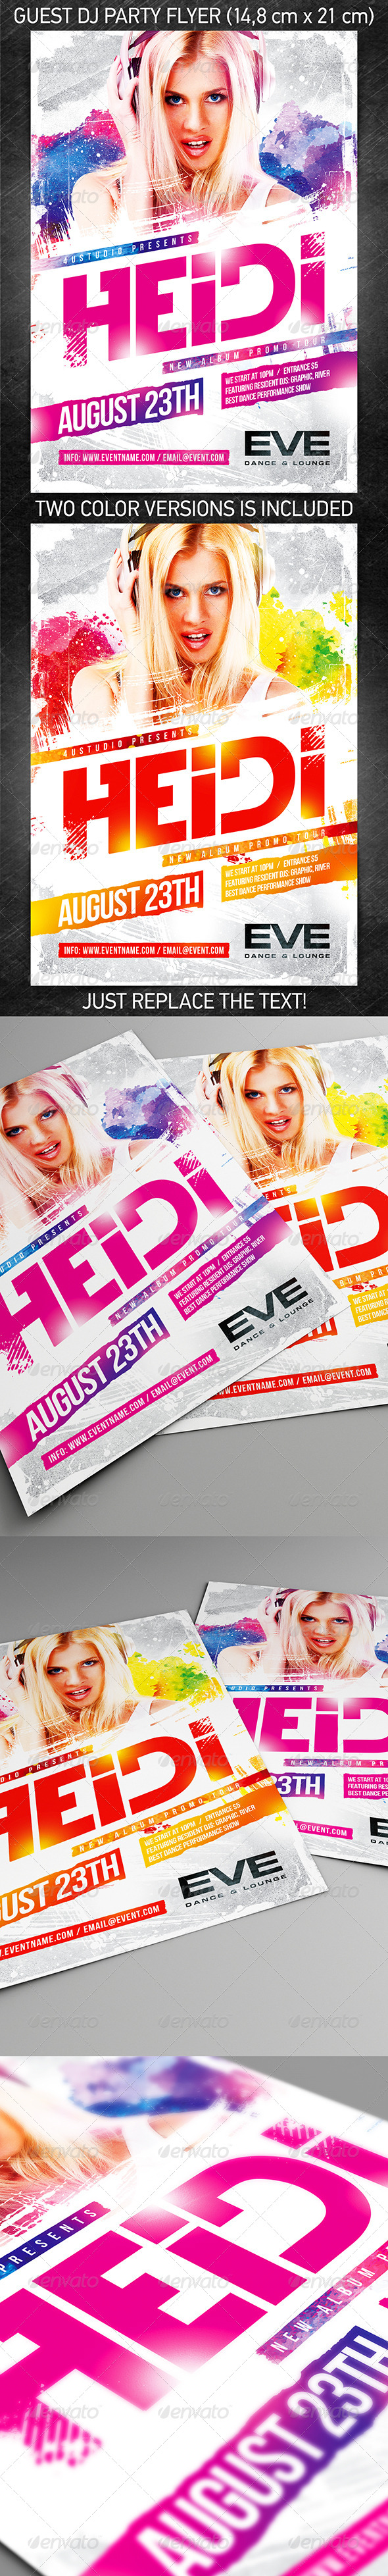 Guest DJ Party Flyer vol.6 - Clubs & Parties Events